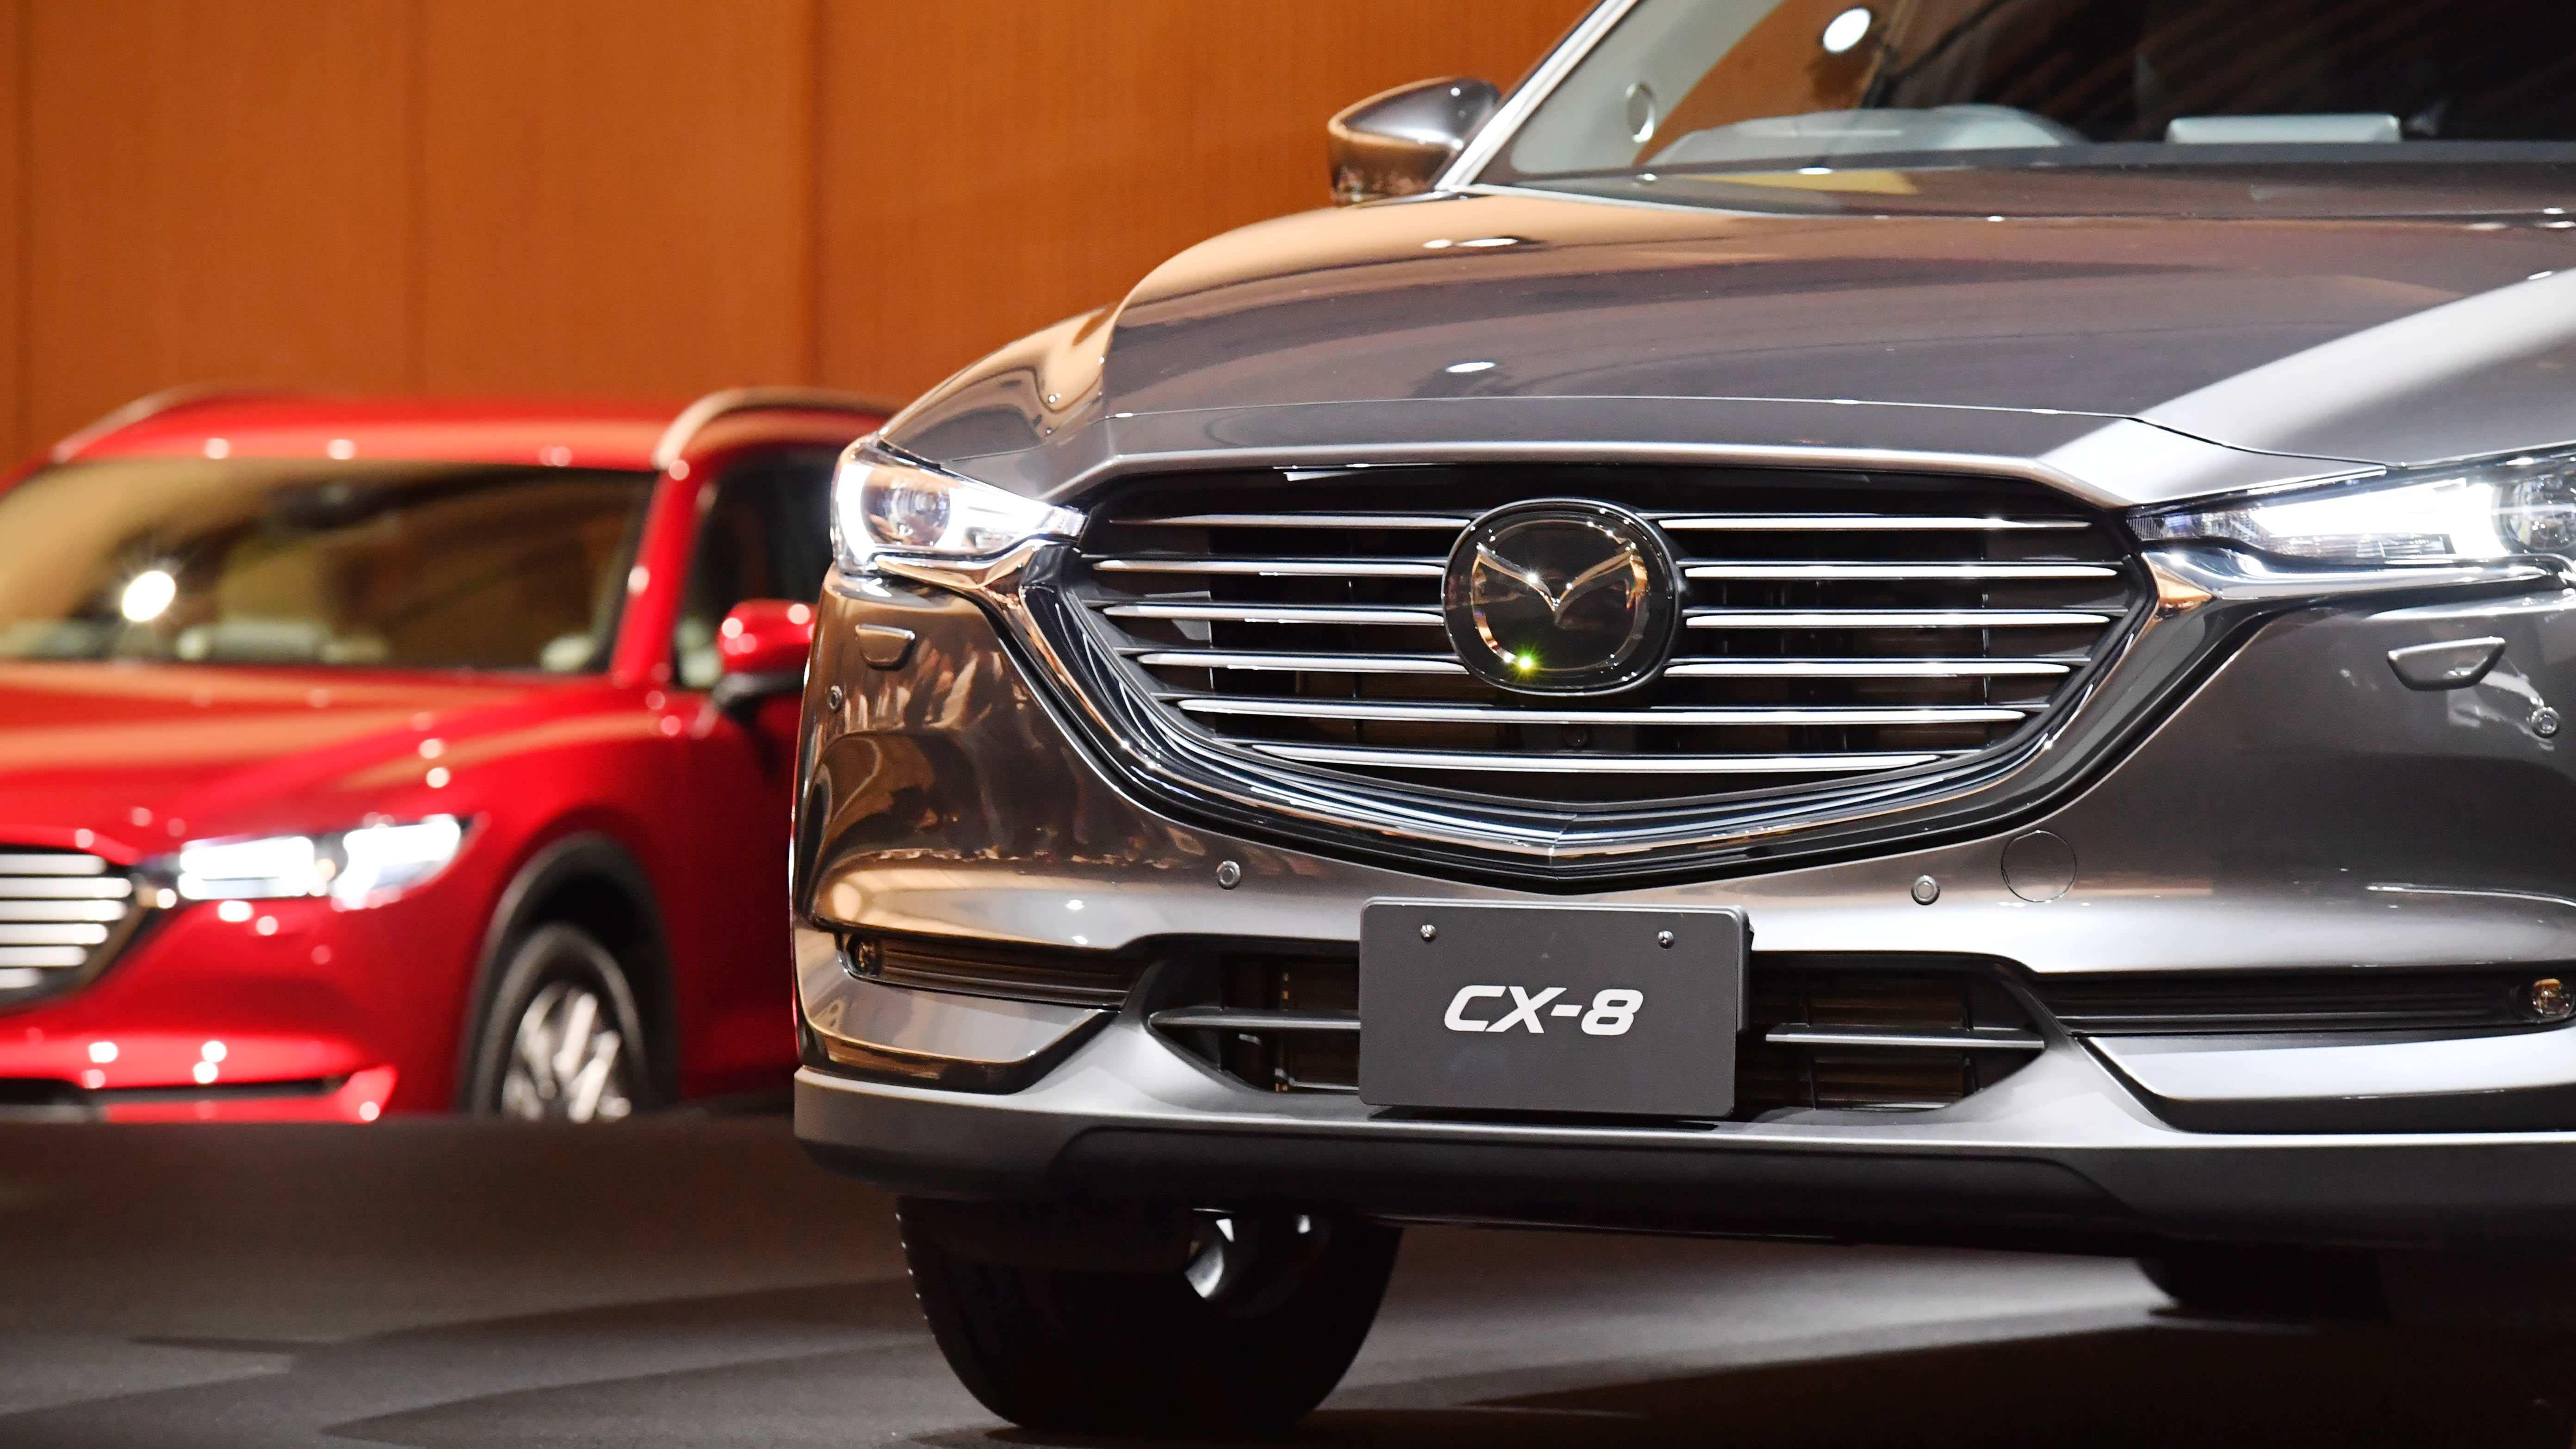 57 New Mazda Cx 5 Hybrid 2020 First Drive for Mazda Cx 5 Hybrid 2020